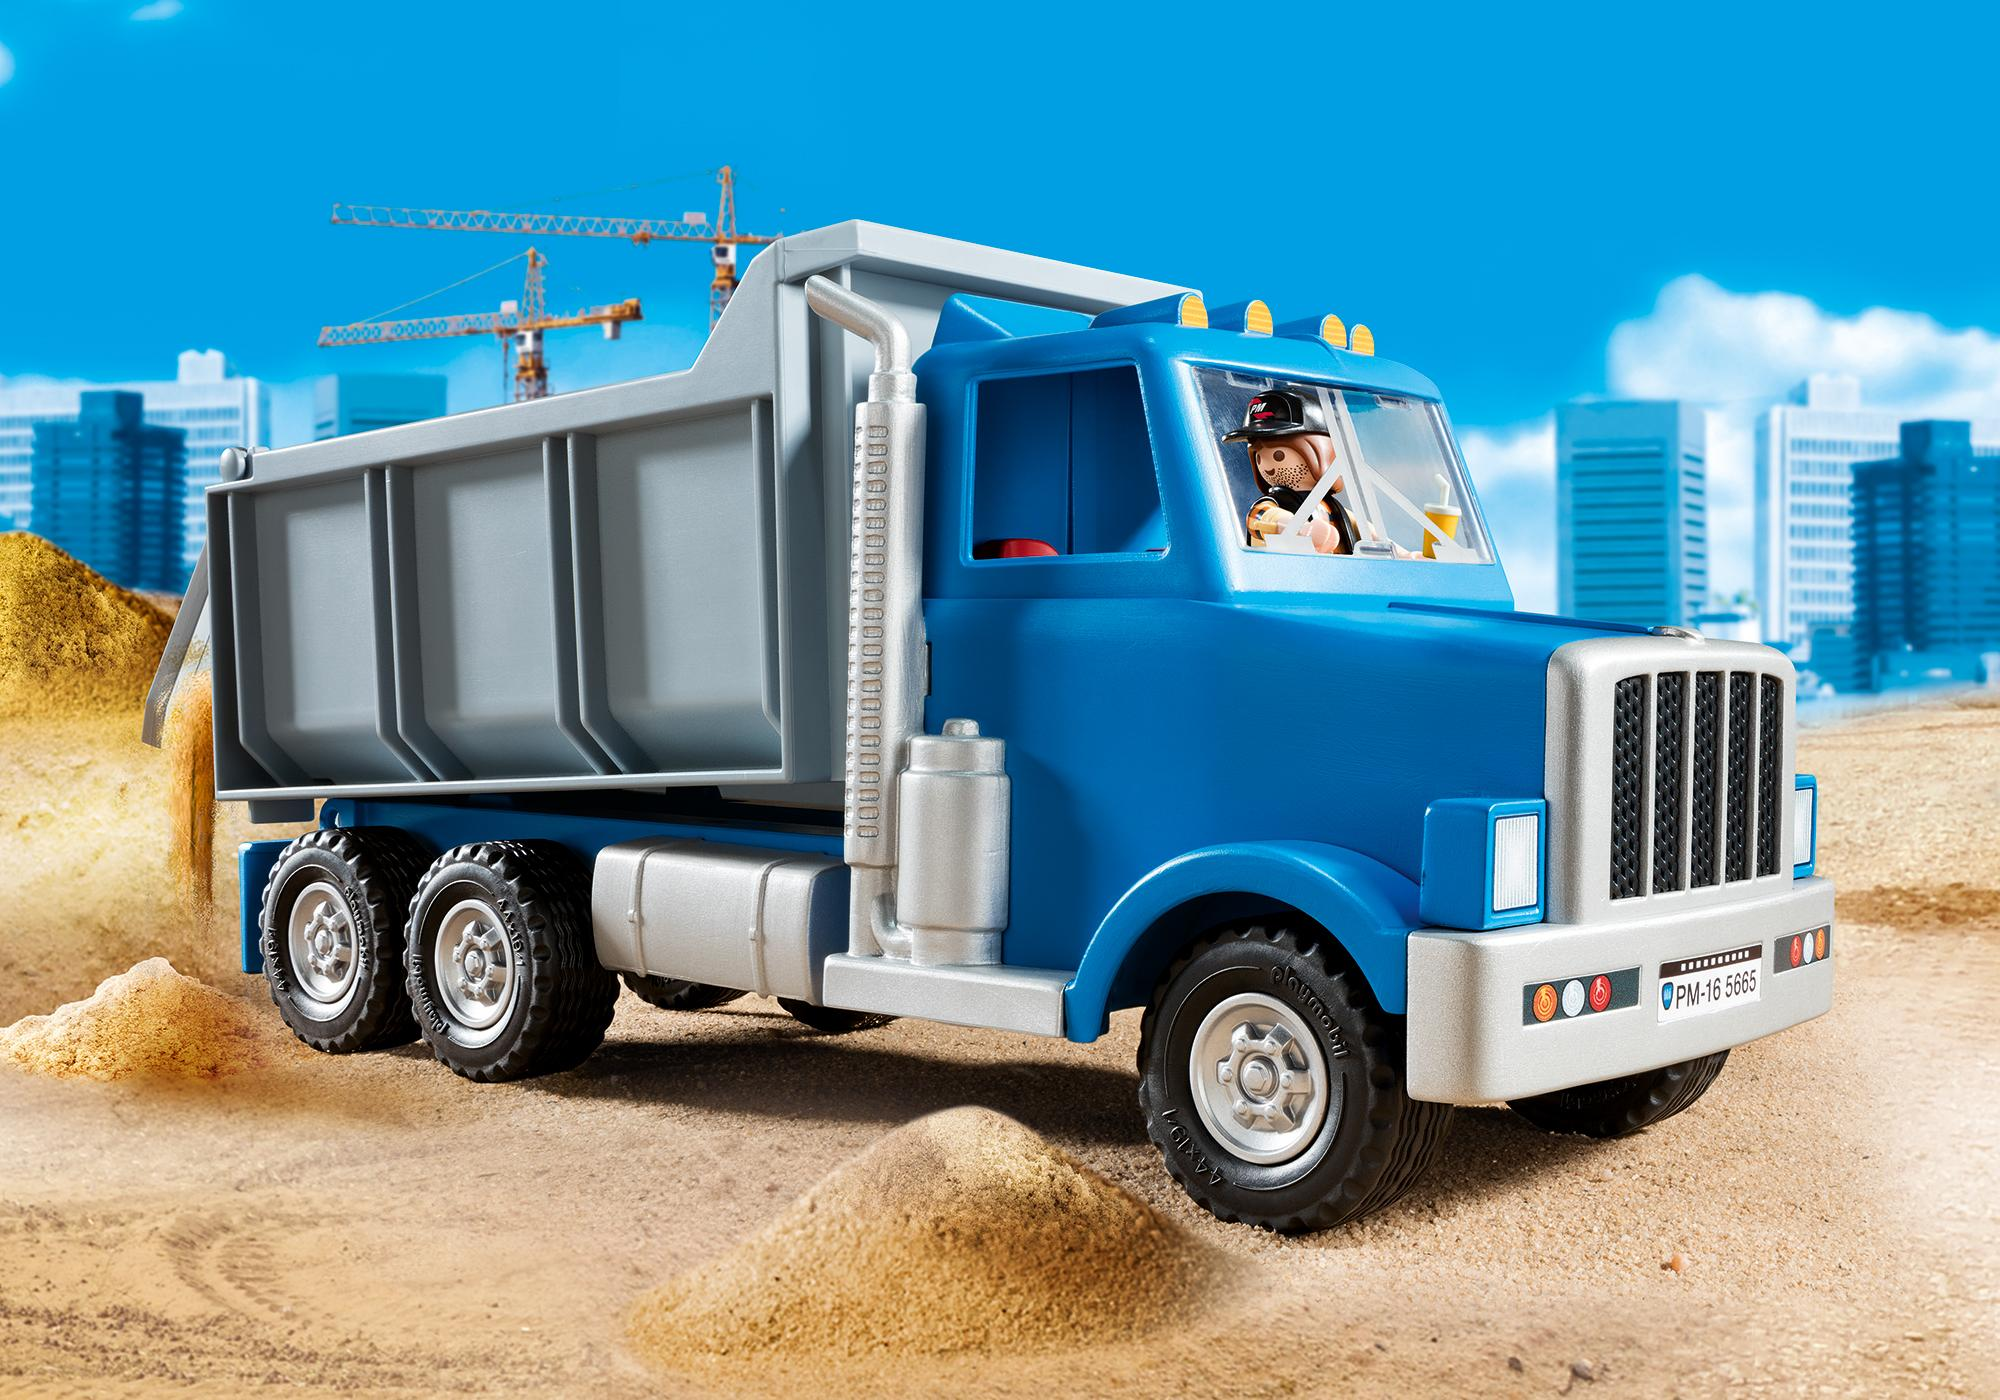 5665_product_detail/Dump Truck